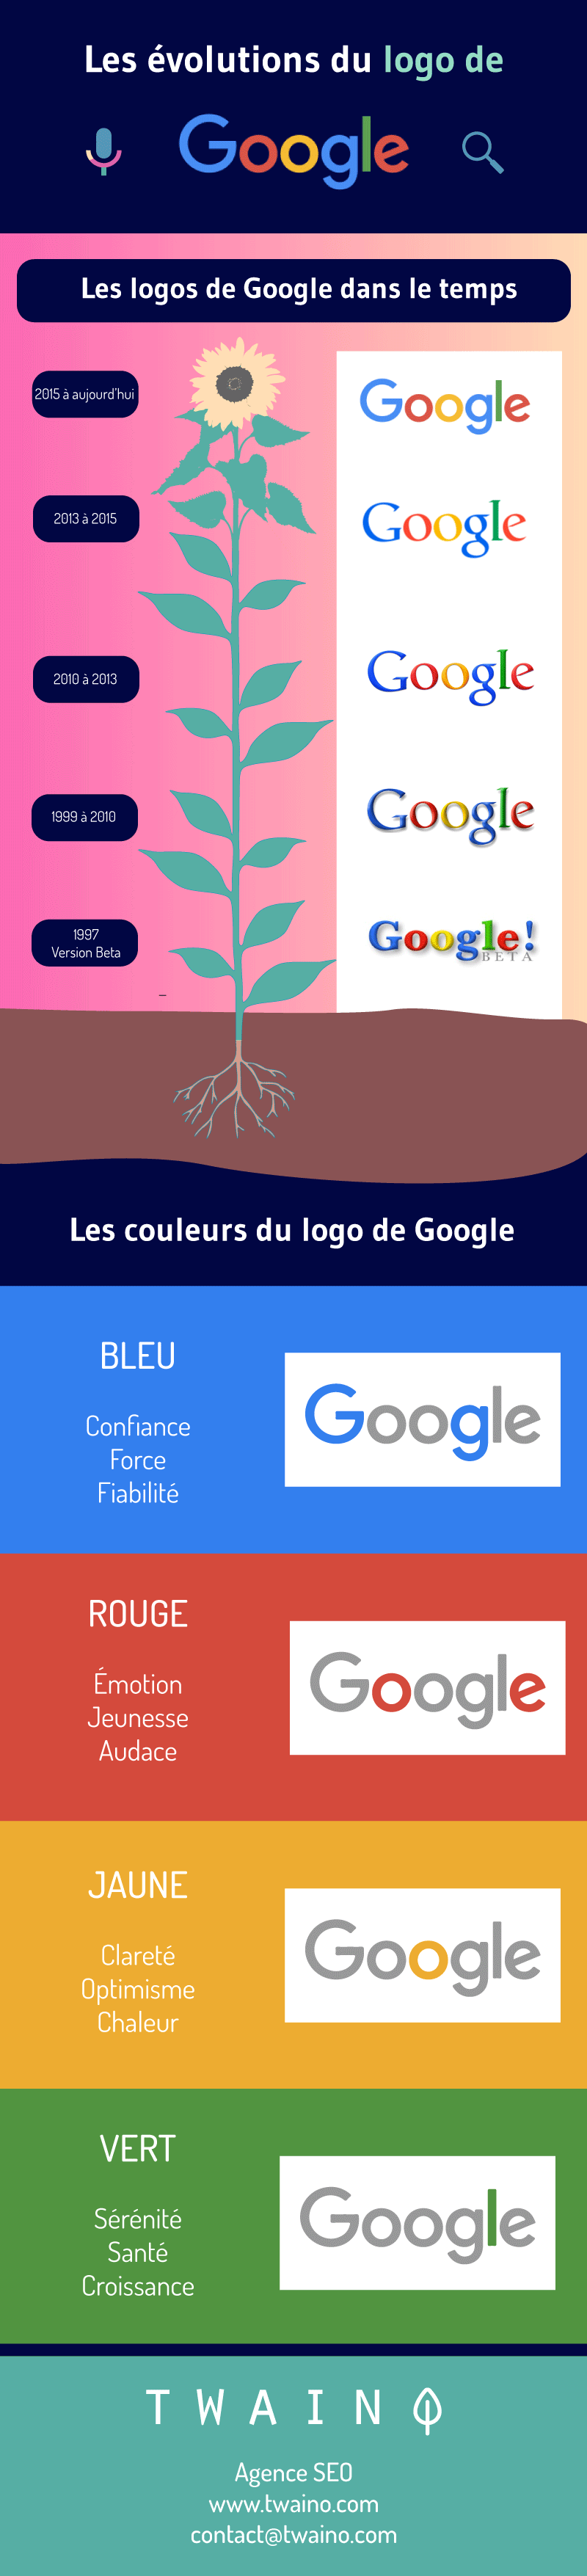 Infographie evolution logo Google